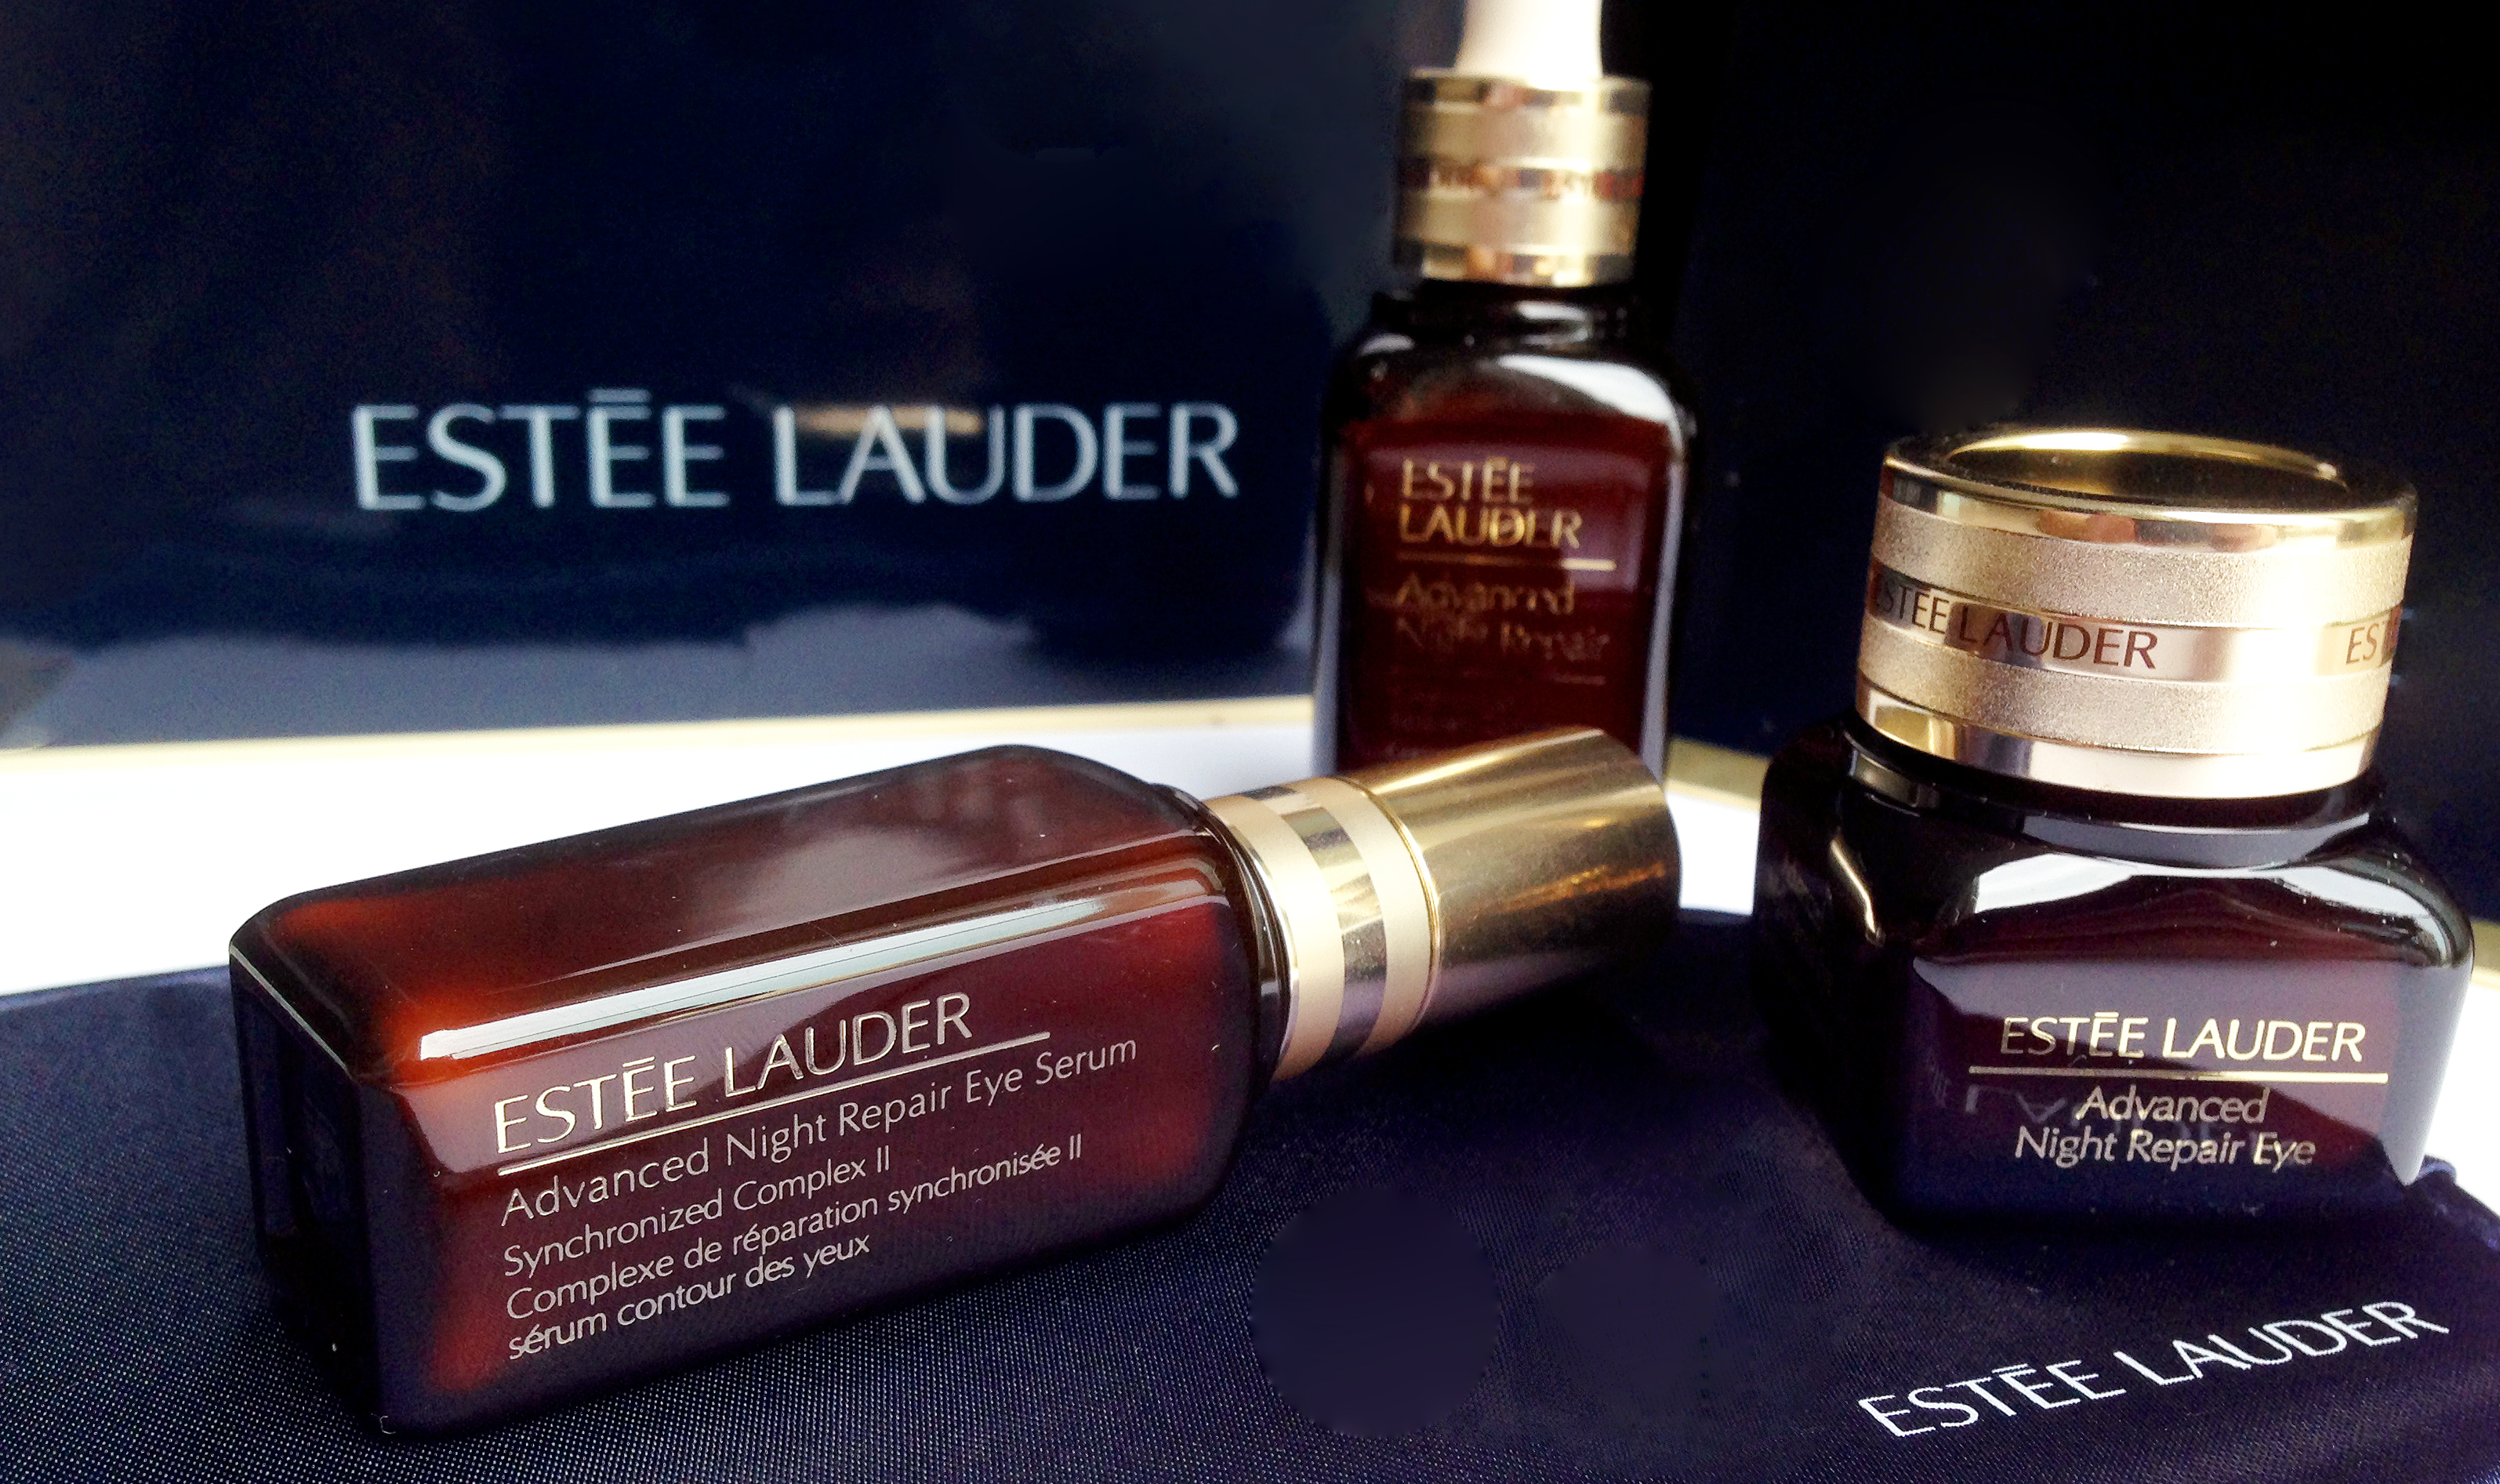 Estee Lauder Advanced Night Repair Ingredients